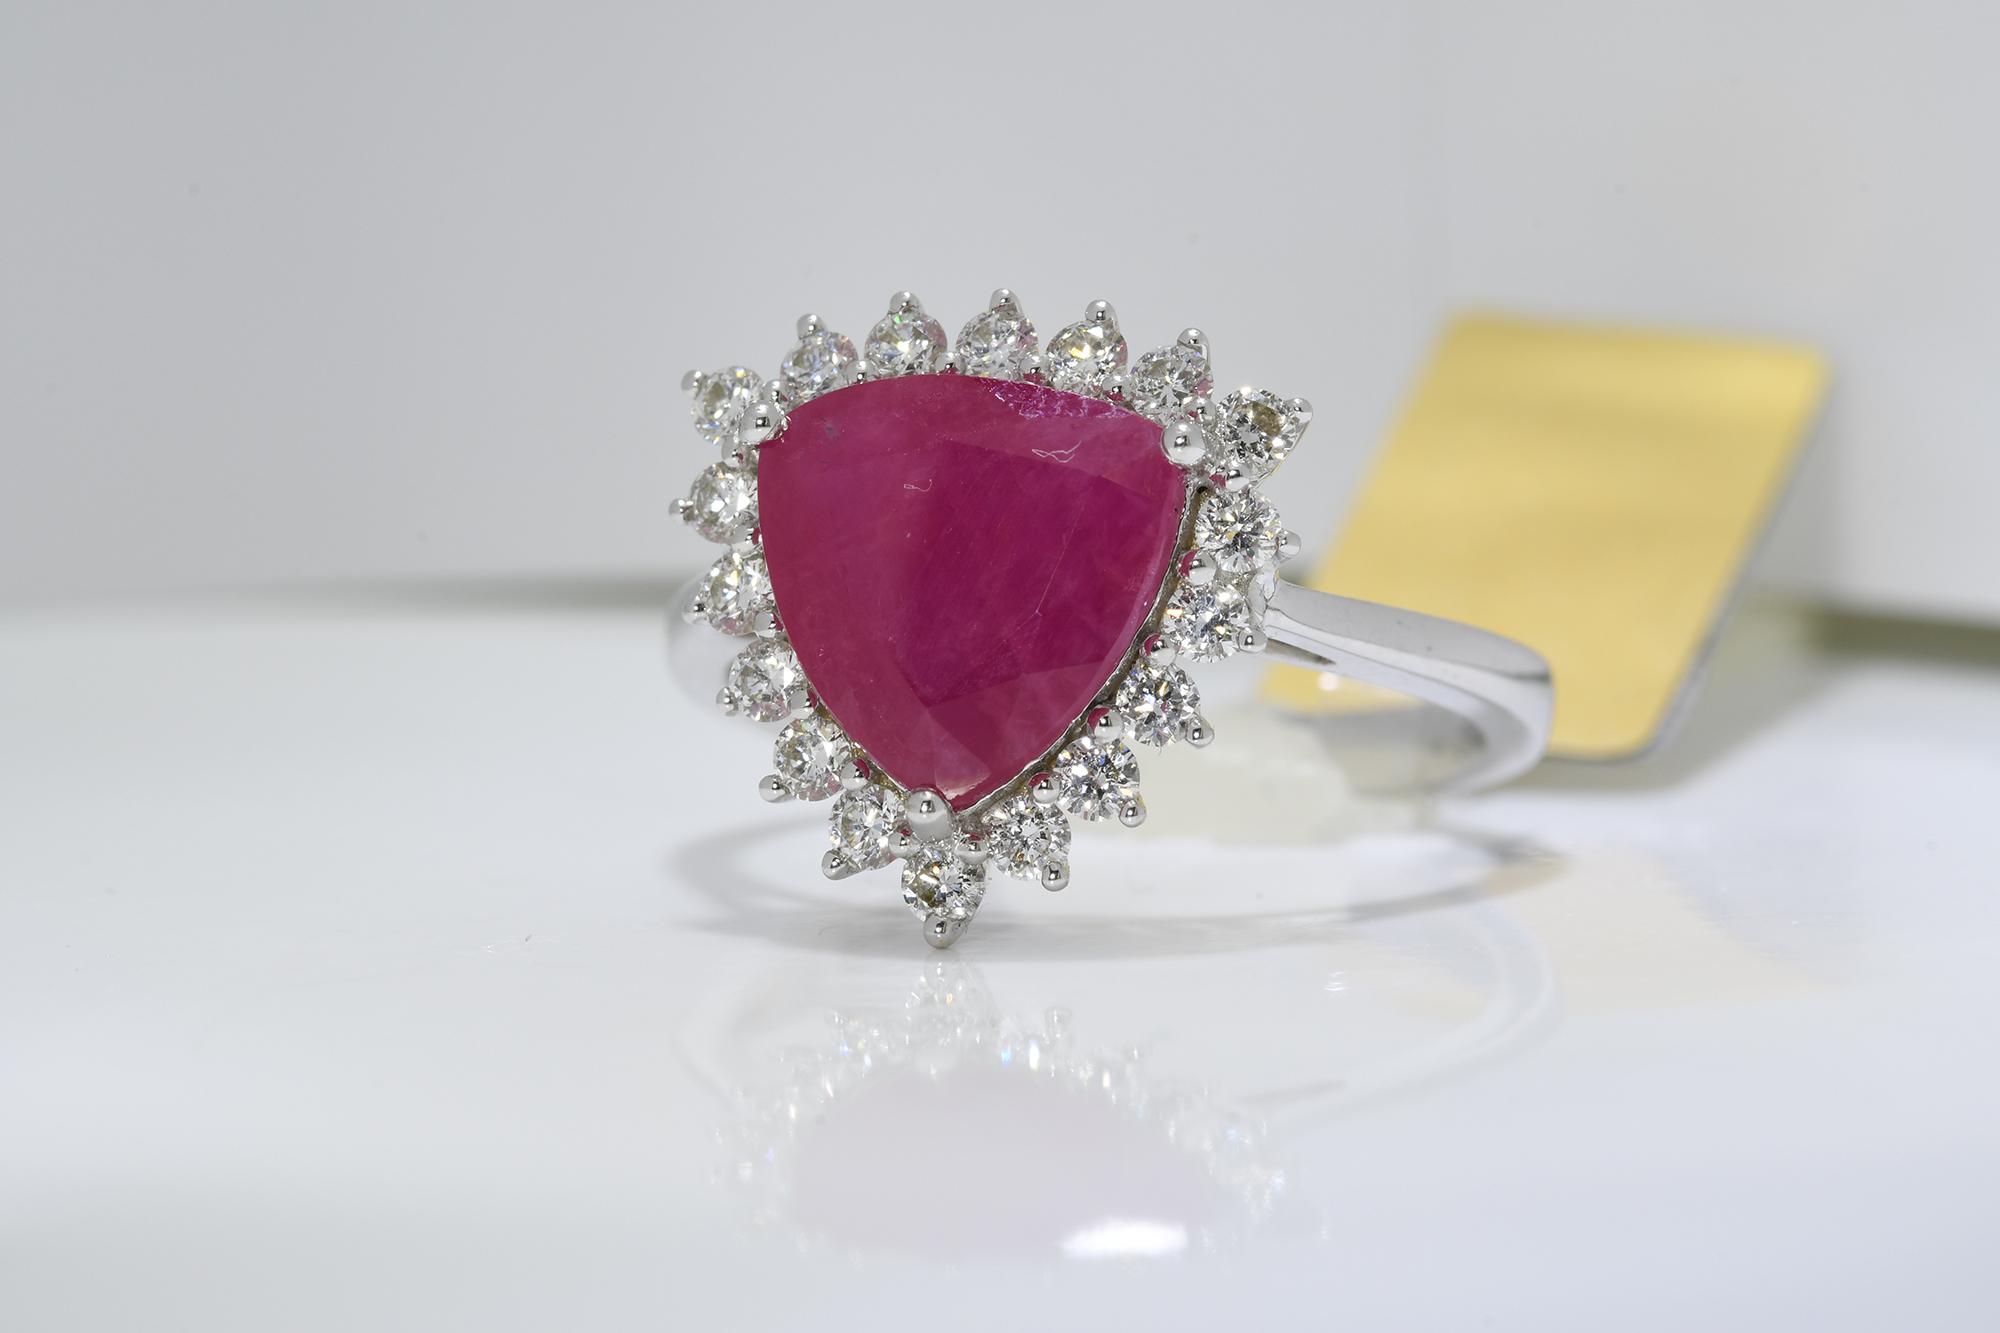 Ruby & Diamond Ring - Image 3 of 3